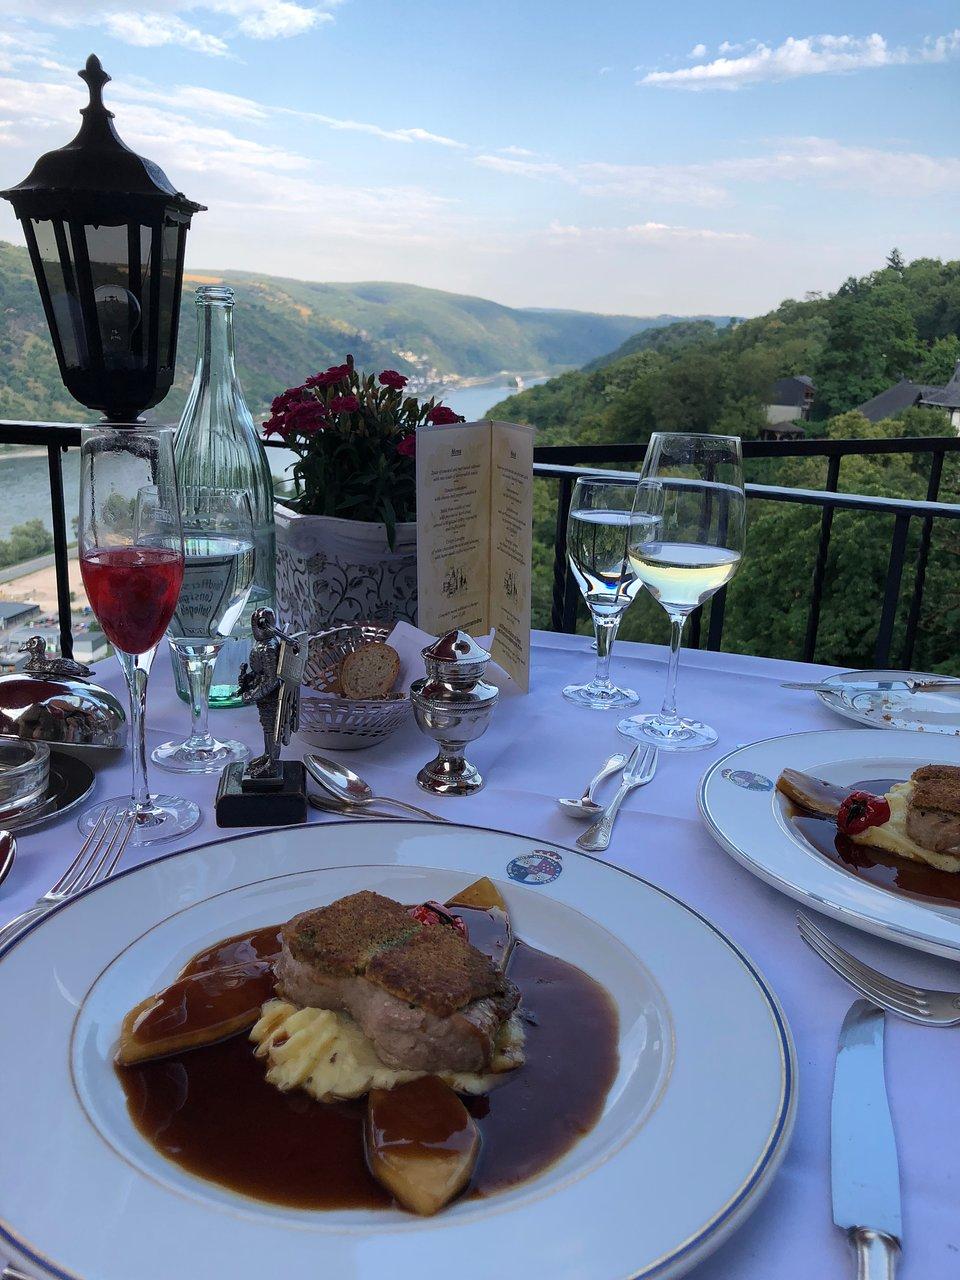 Castle Hotel Auf Schoenburg Updated 2018 Prices Reviews Germany Oberwesel Tripadvisor